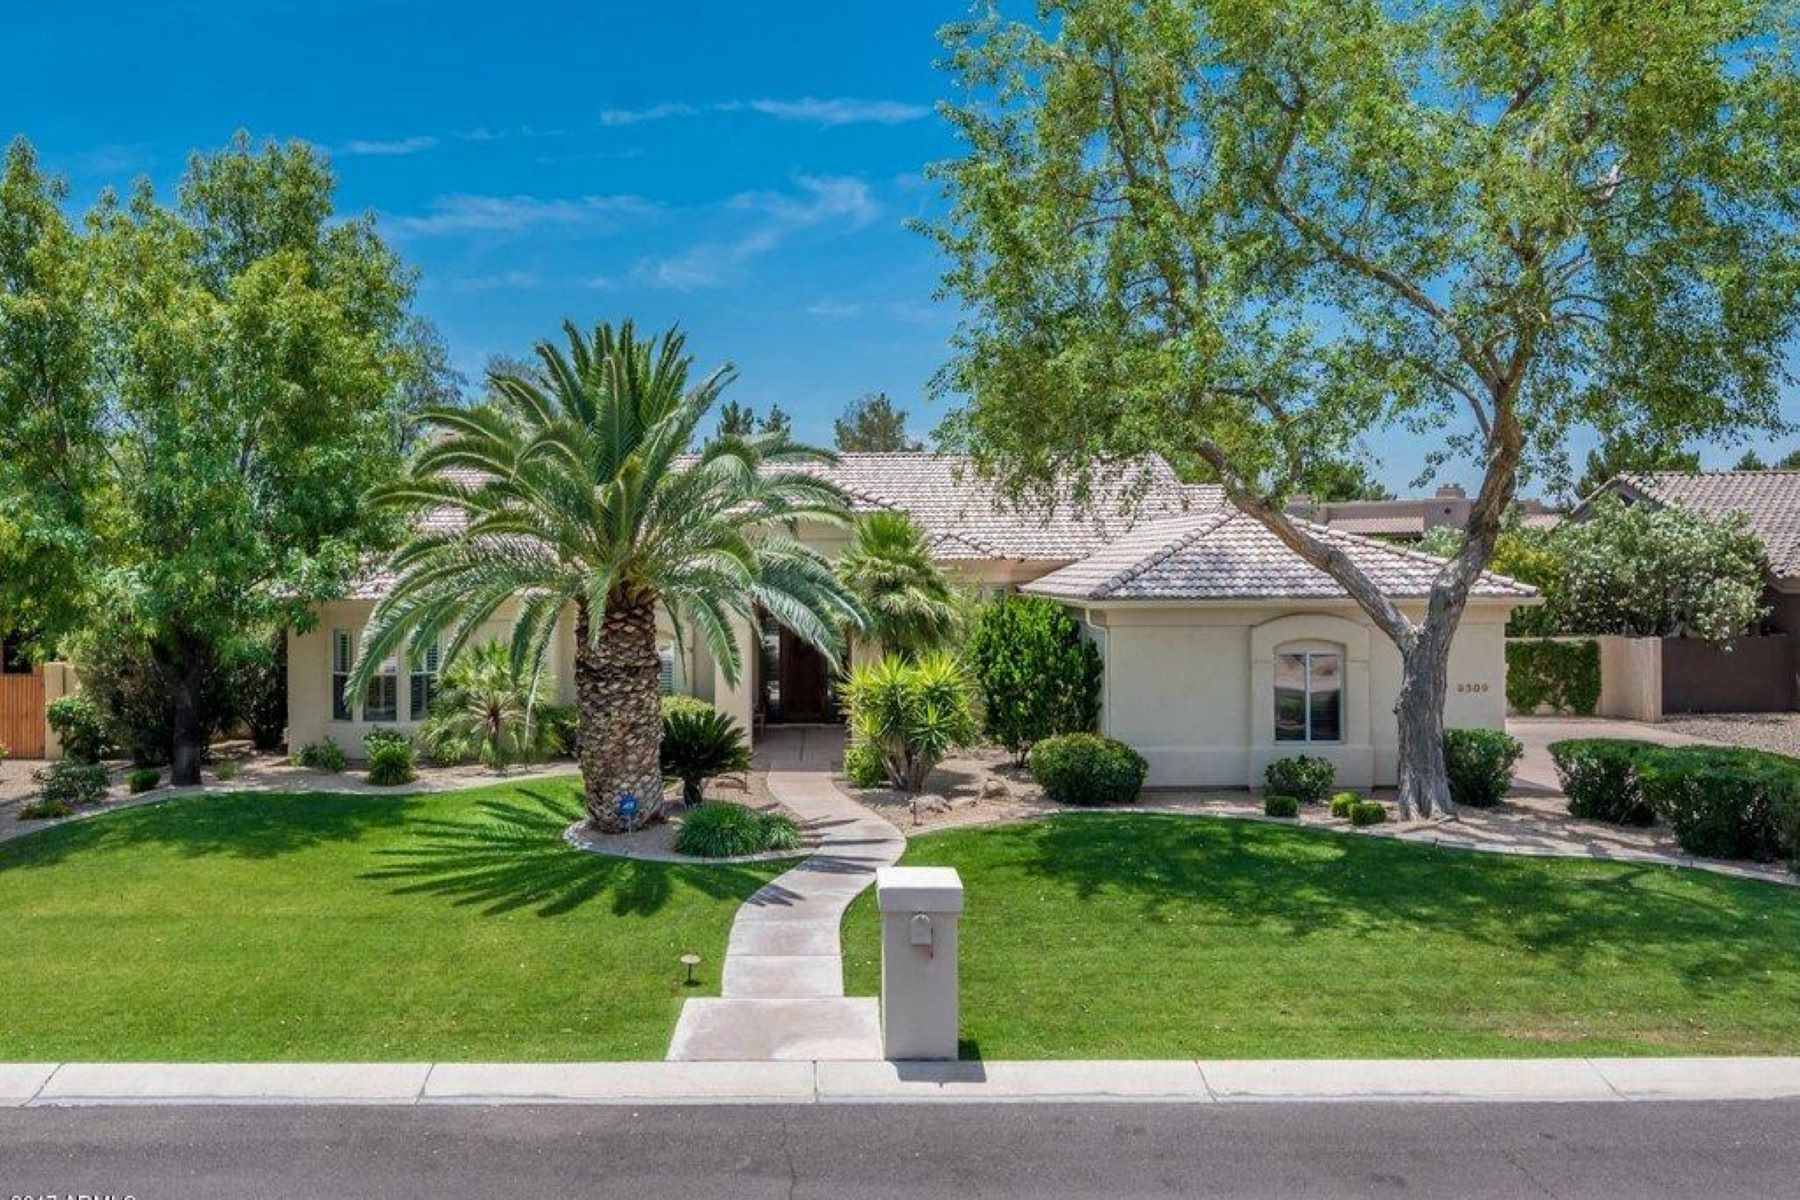 獨棟家庭住宅 為 出售 在 Stunning custom home in the upscale San Serena Estates 9509 E Desert Cove Avenue Scottsdale, 亞利桑那州, 85260 美國